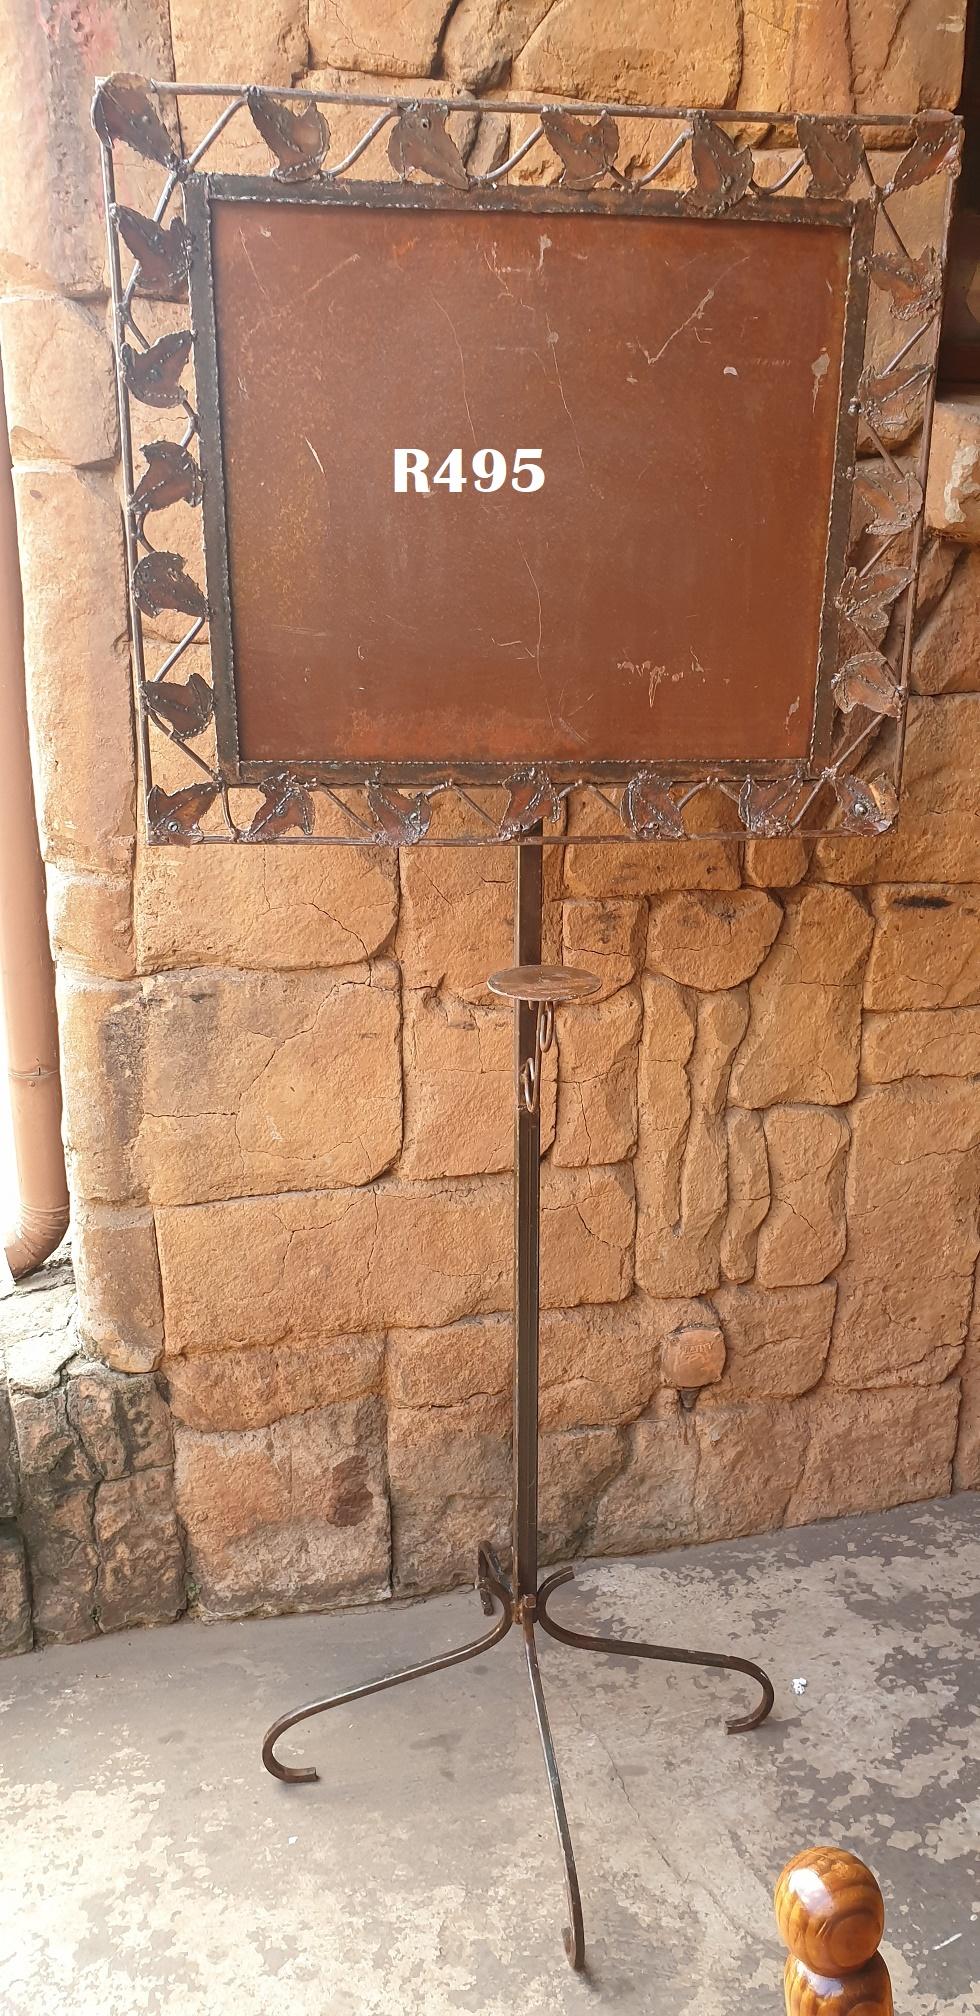 Steel Event Menu or Notice Board (730x625x1770)